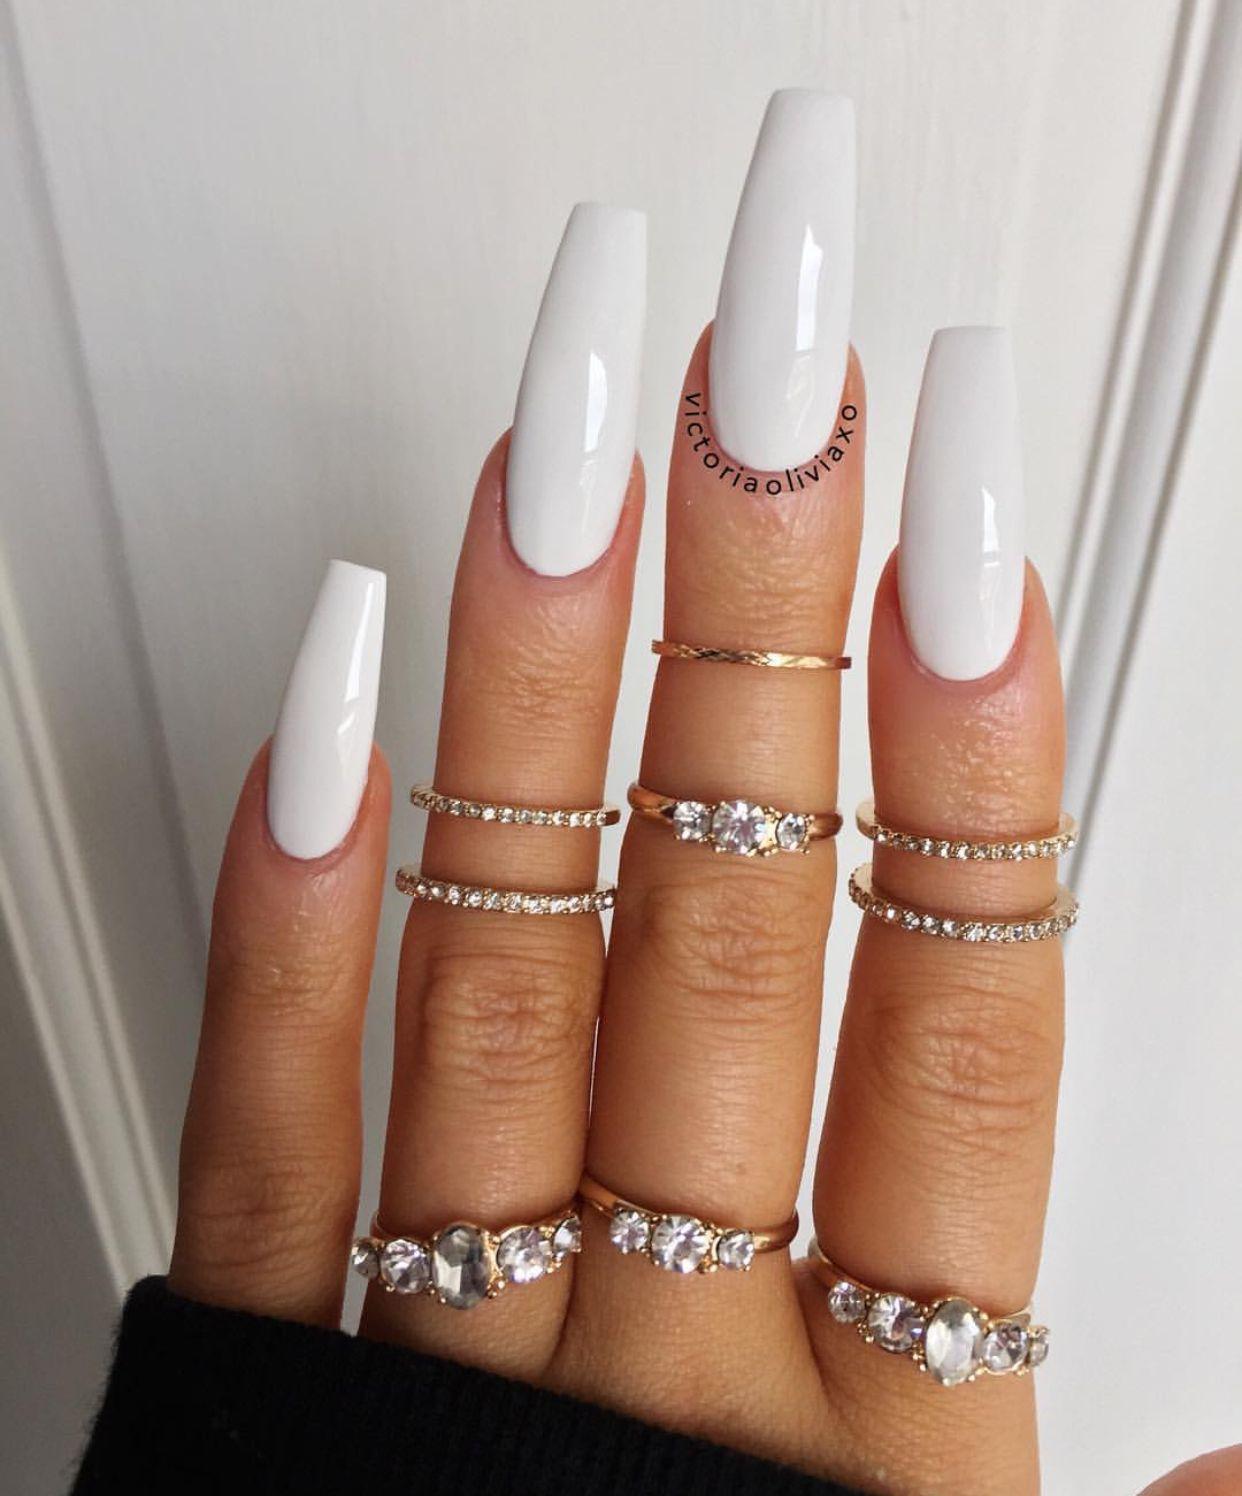 Long White Nails : white, nails, Lamiece, Nicole, NAILS, White, Nails,, Coffin, Nails, Long,, Acrylic